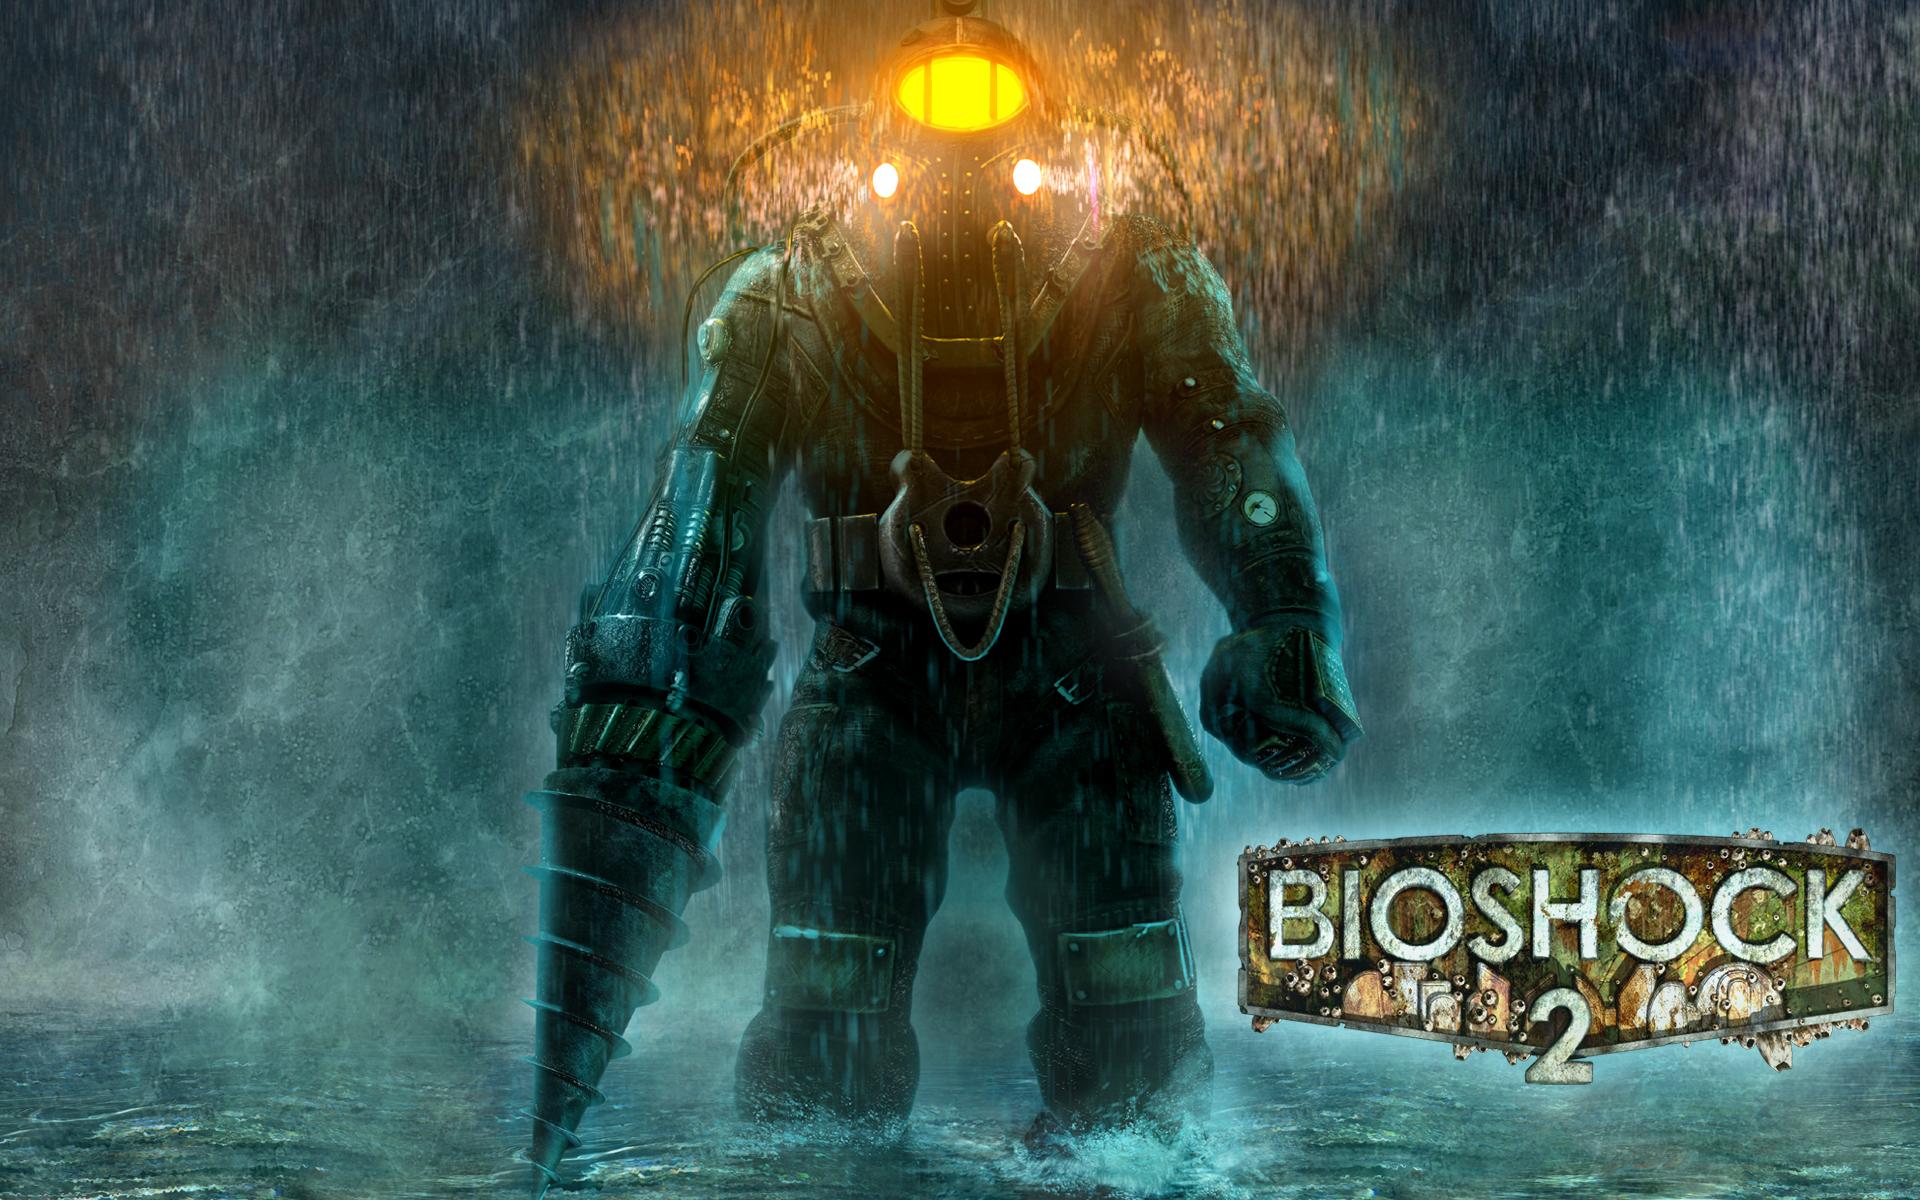 bioshock 2 desktop wallpaper 49011 50661 hd wallpapers